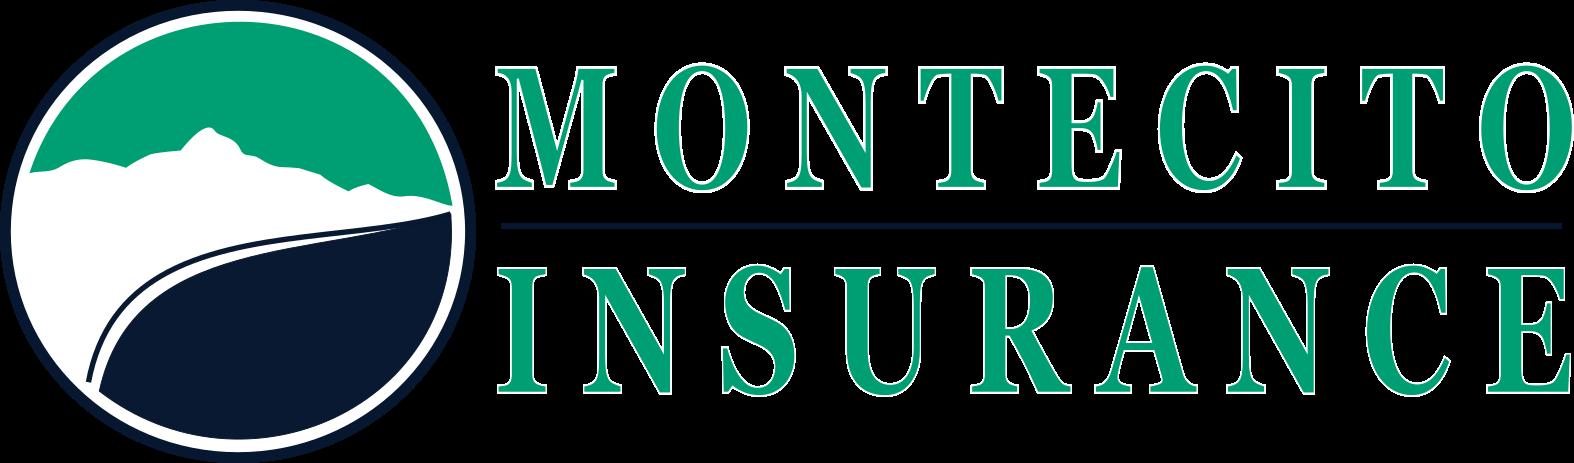 Montecito Insurance